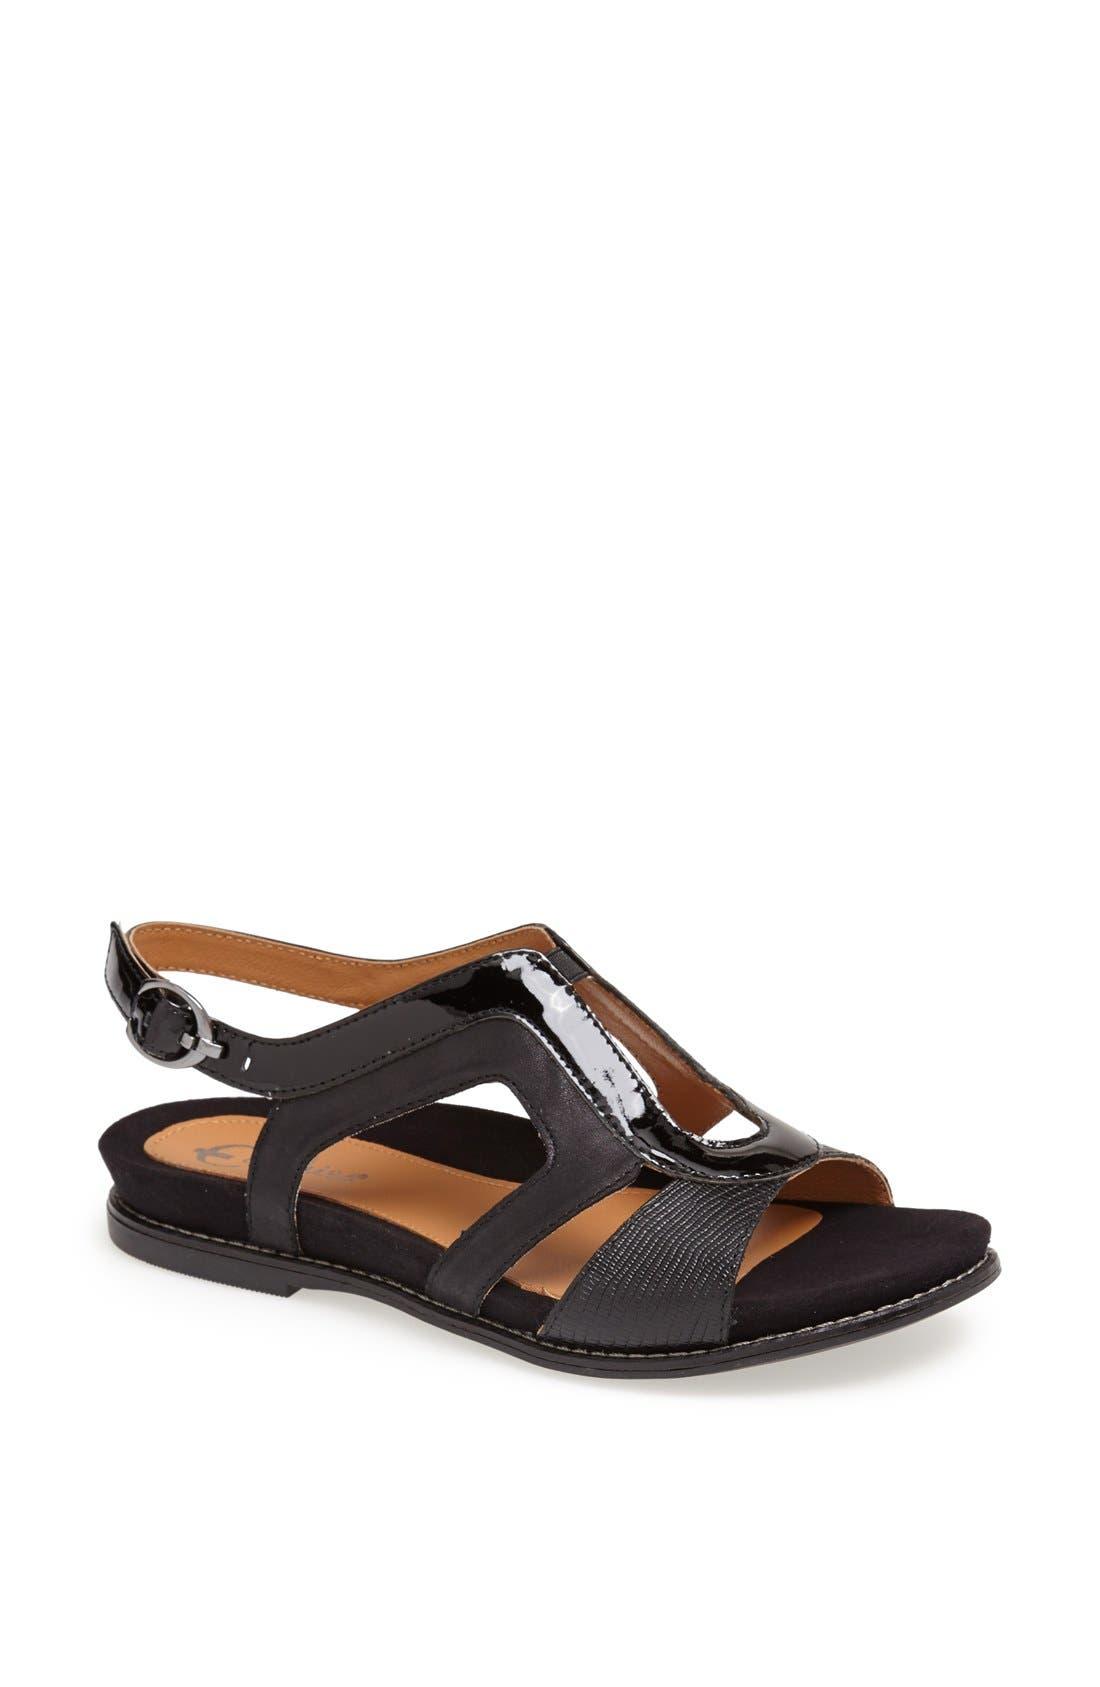 Main Image - Earthies® 'Arvello' Sandal